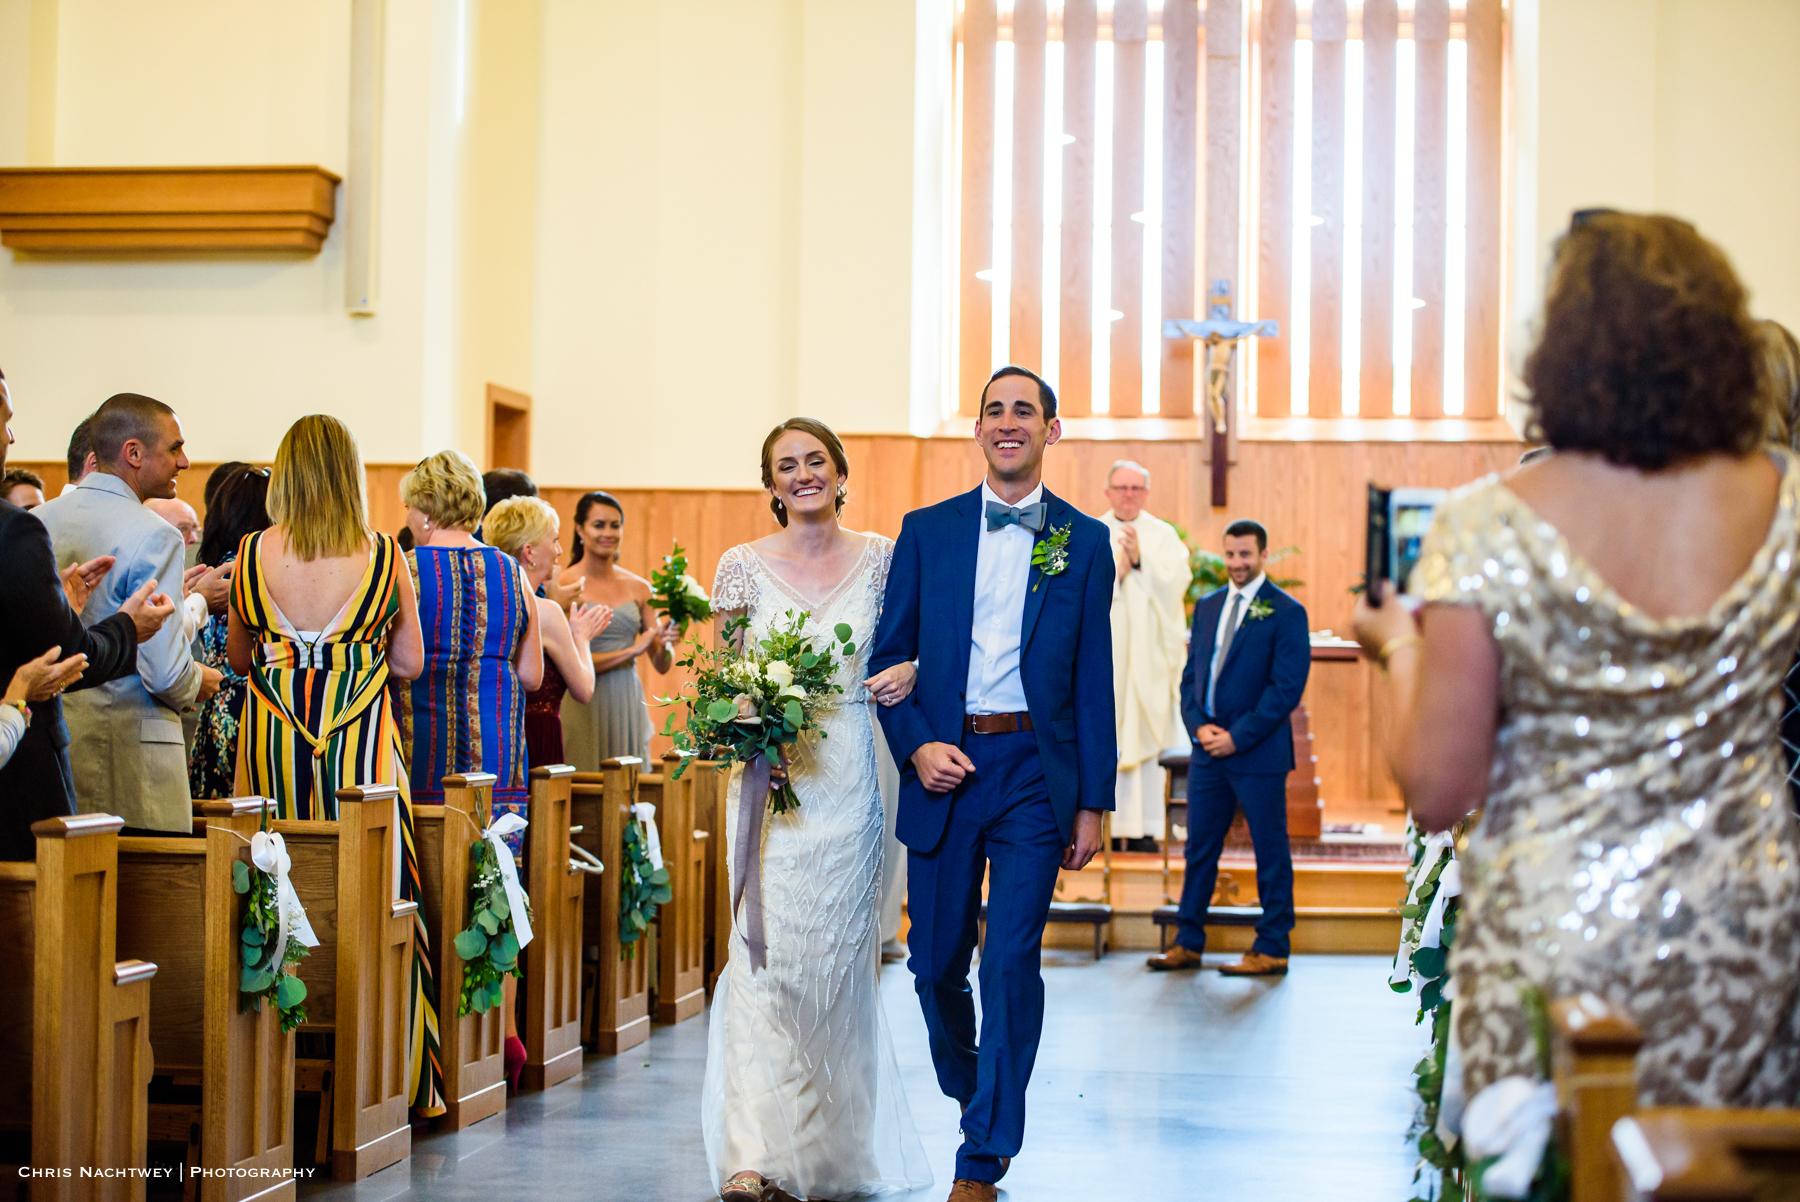 photos-wedding-quidnessett-country-club-ri-chris-nachtwey-photography-2018-27.jpg